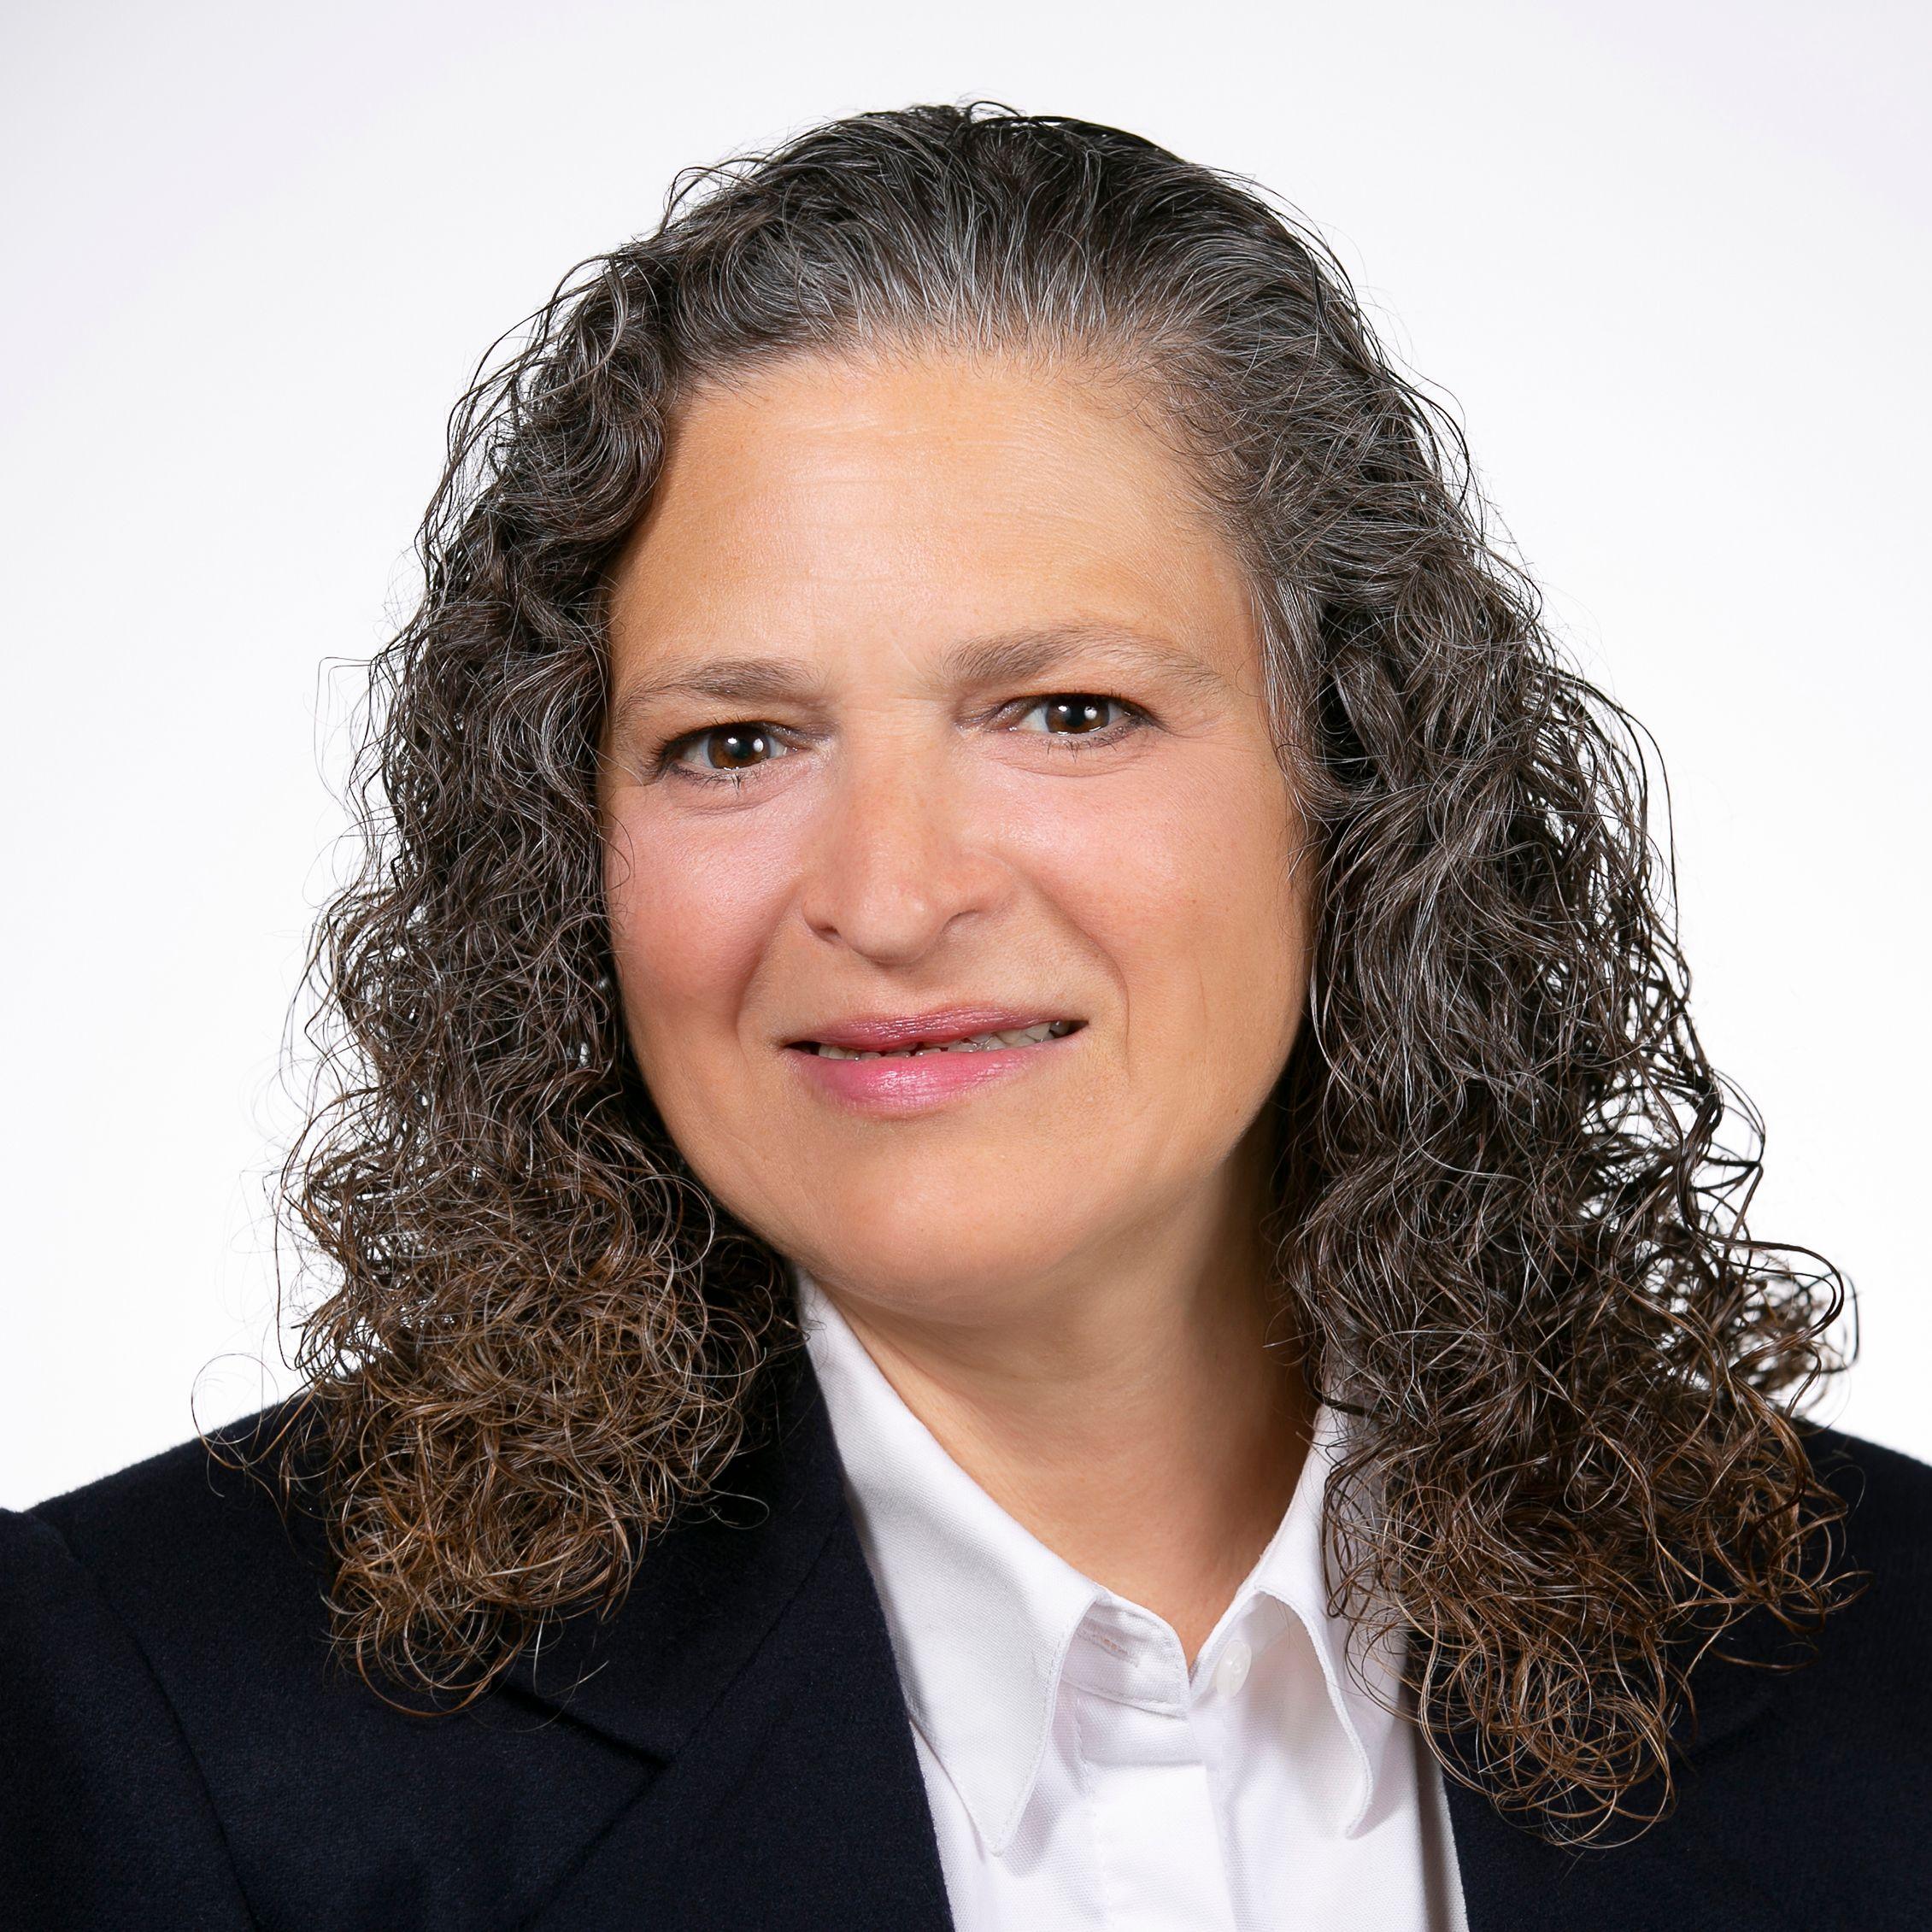 Lisa Descenza